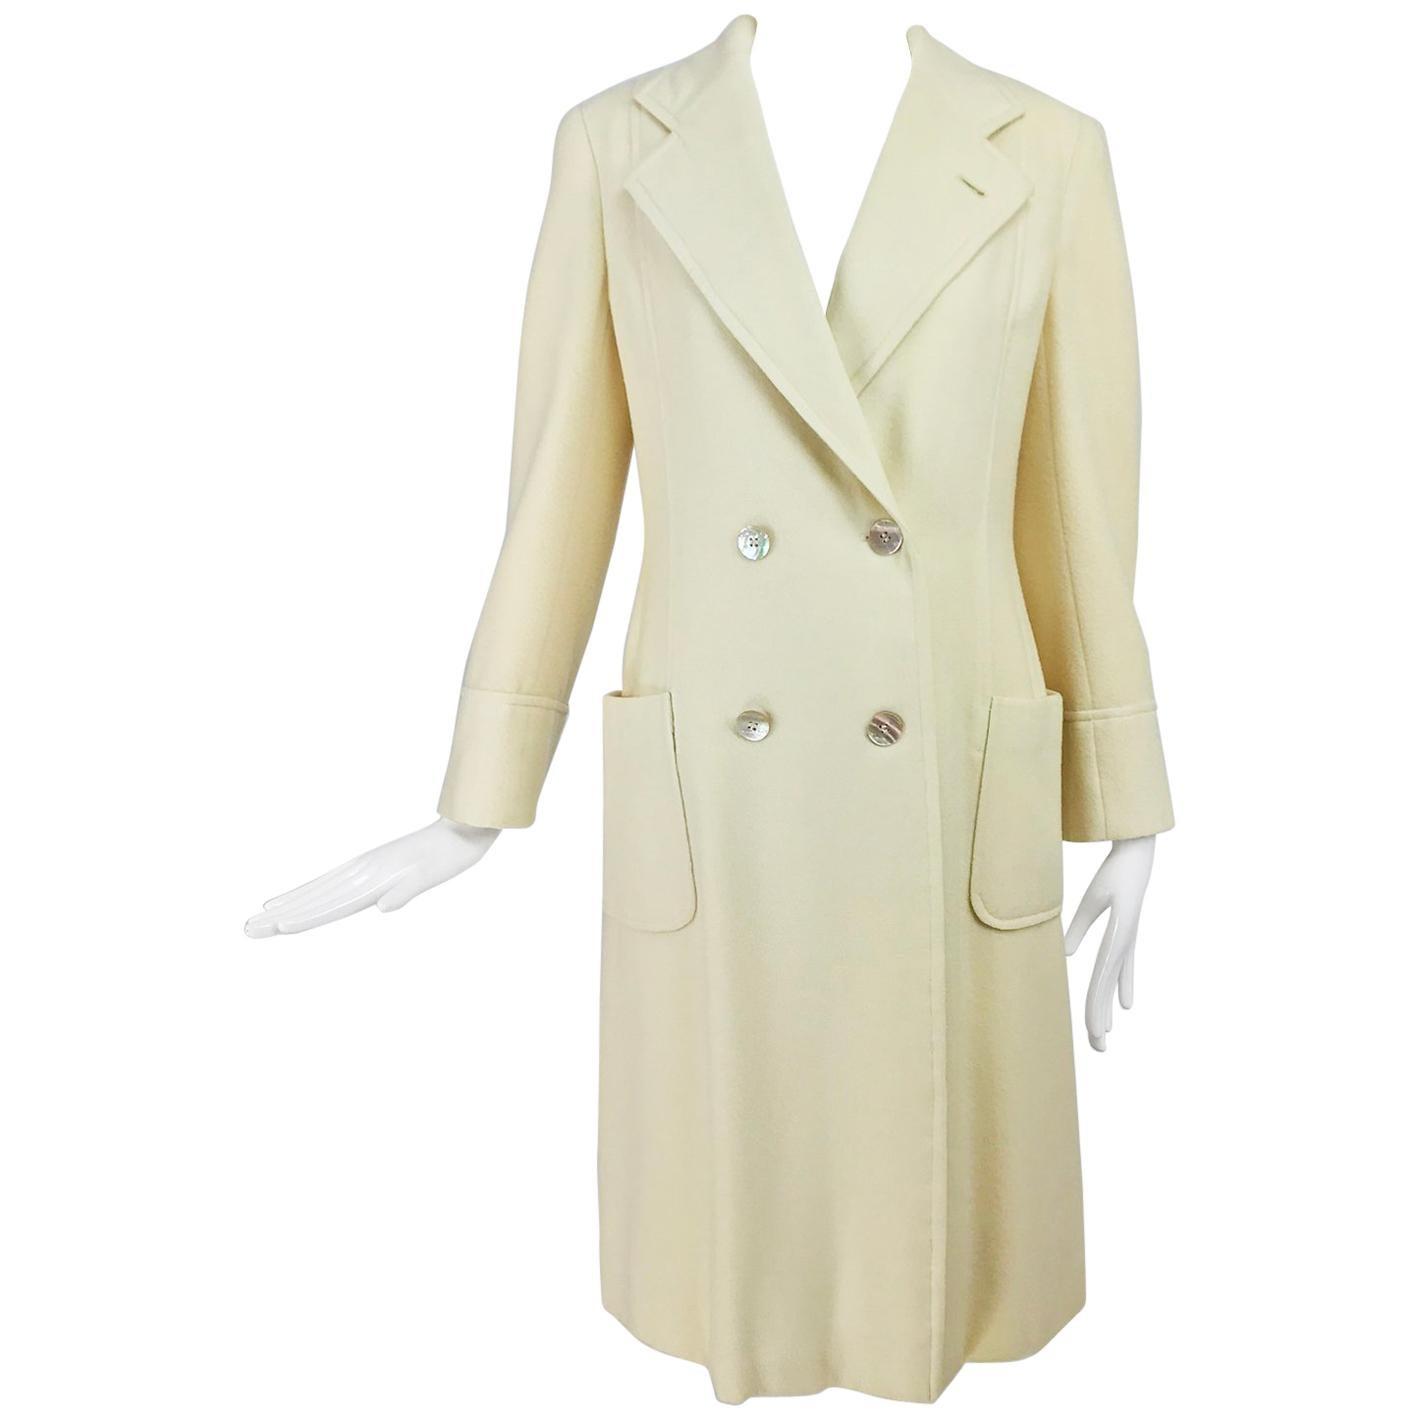 Bill Blass winter white cashmere classic double breasted coat 1970s